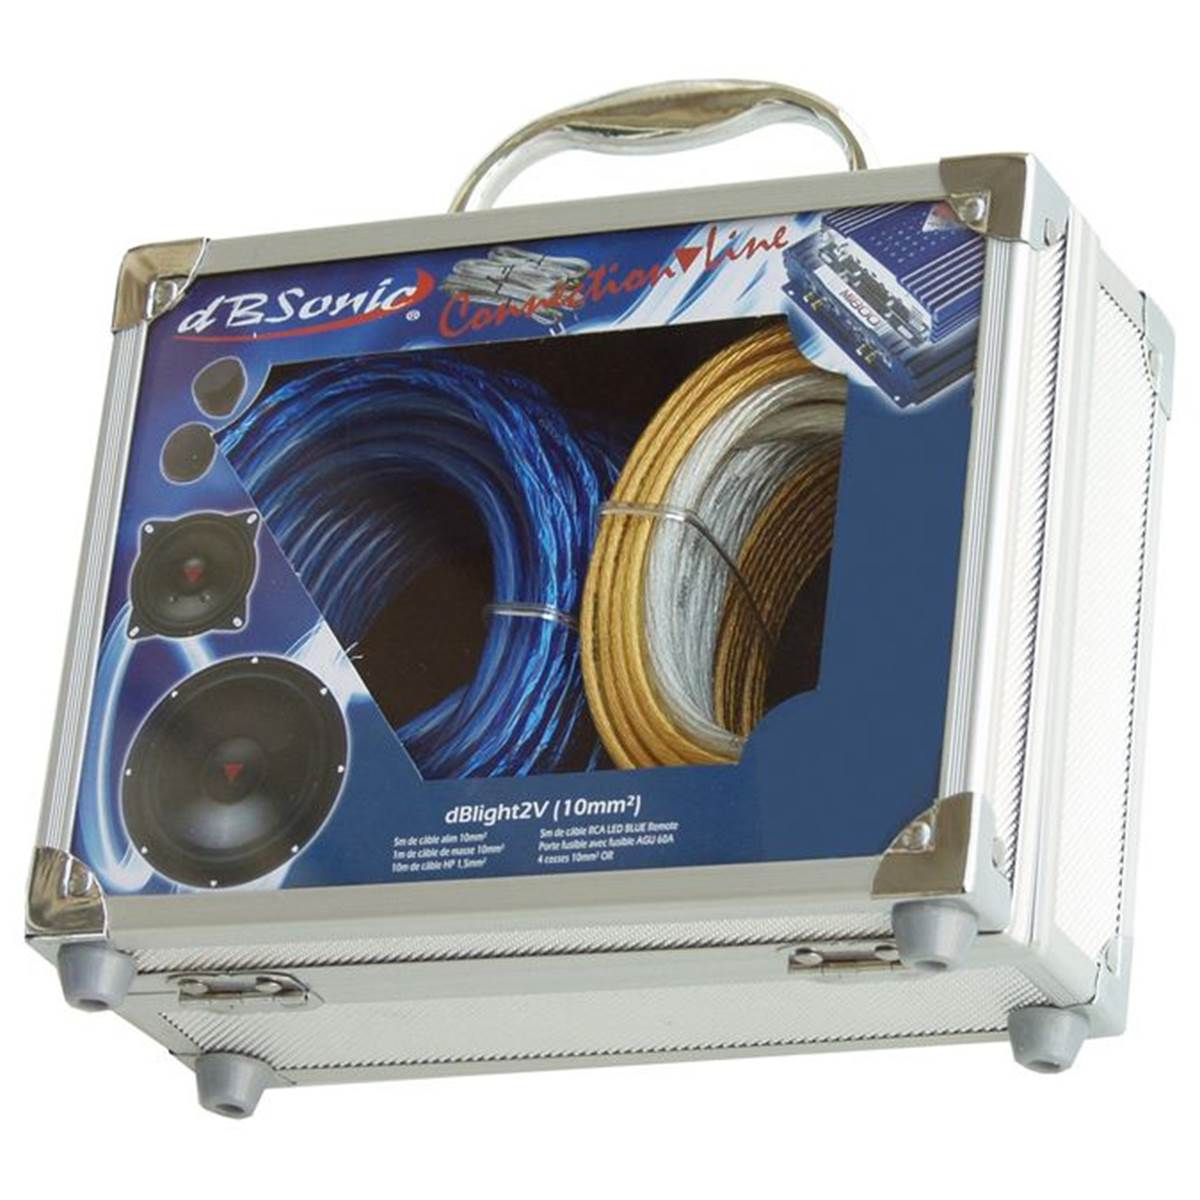 Kit d'alimentation DB Sonic 20 mm²